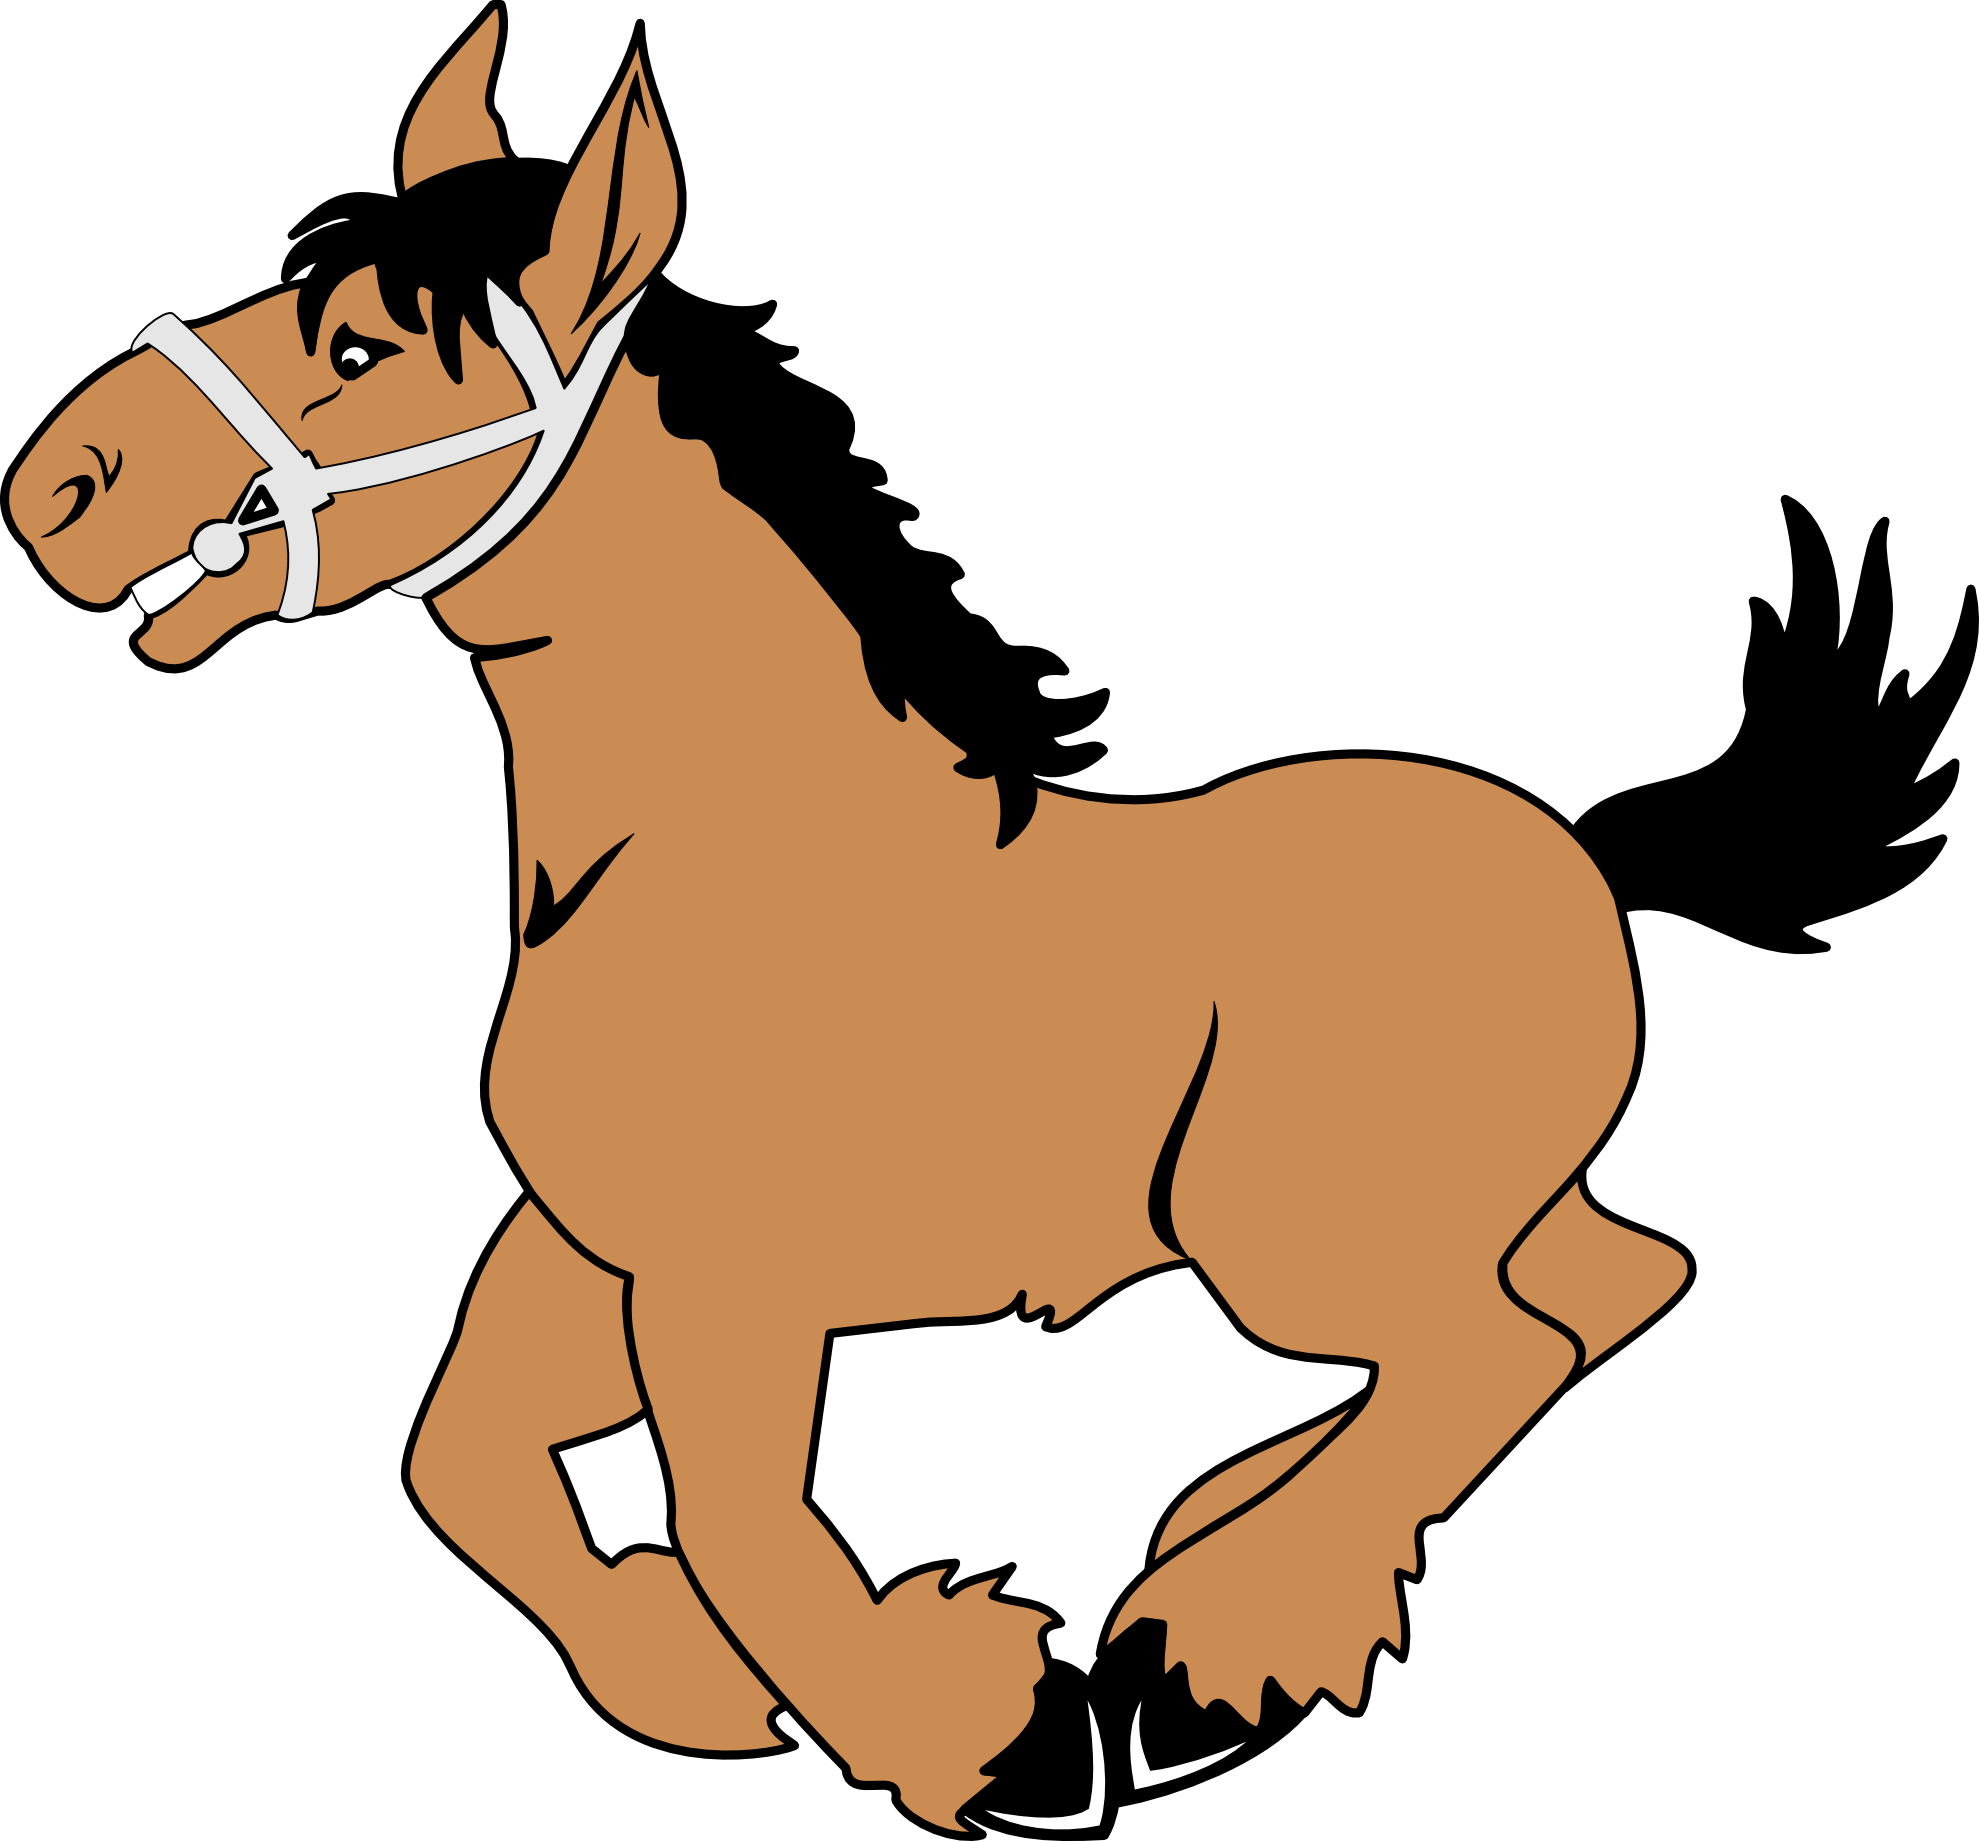 Clip Art Horse - Clipart Library-Clip Art Horse - Clipart library-0